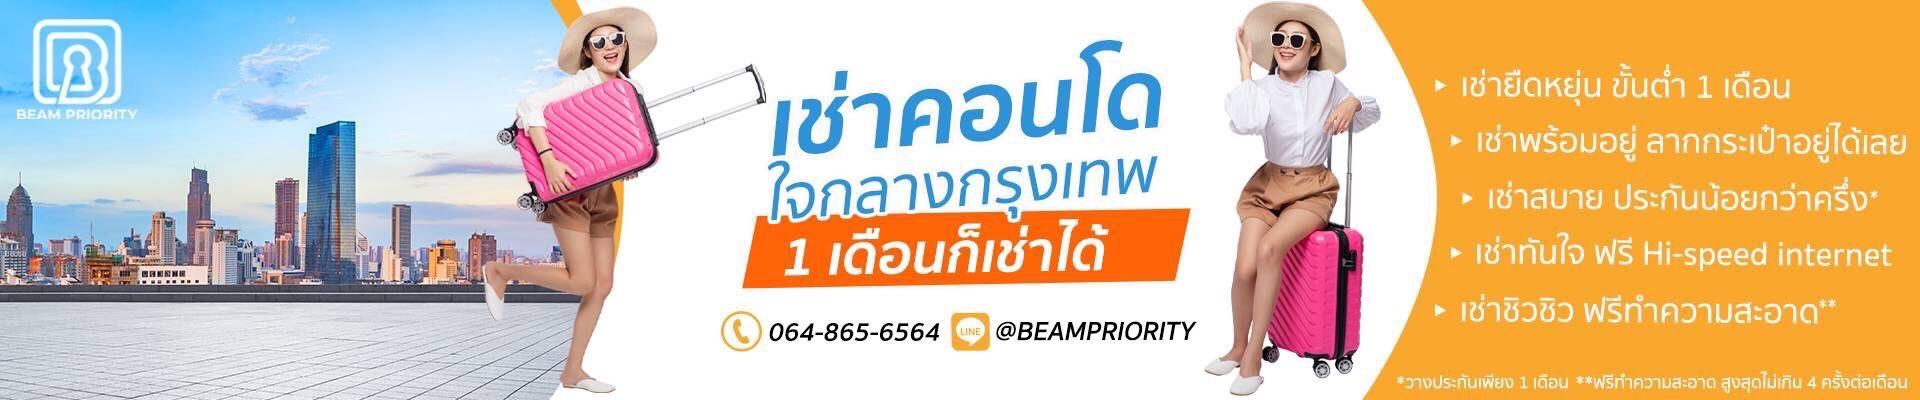 Beampriority